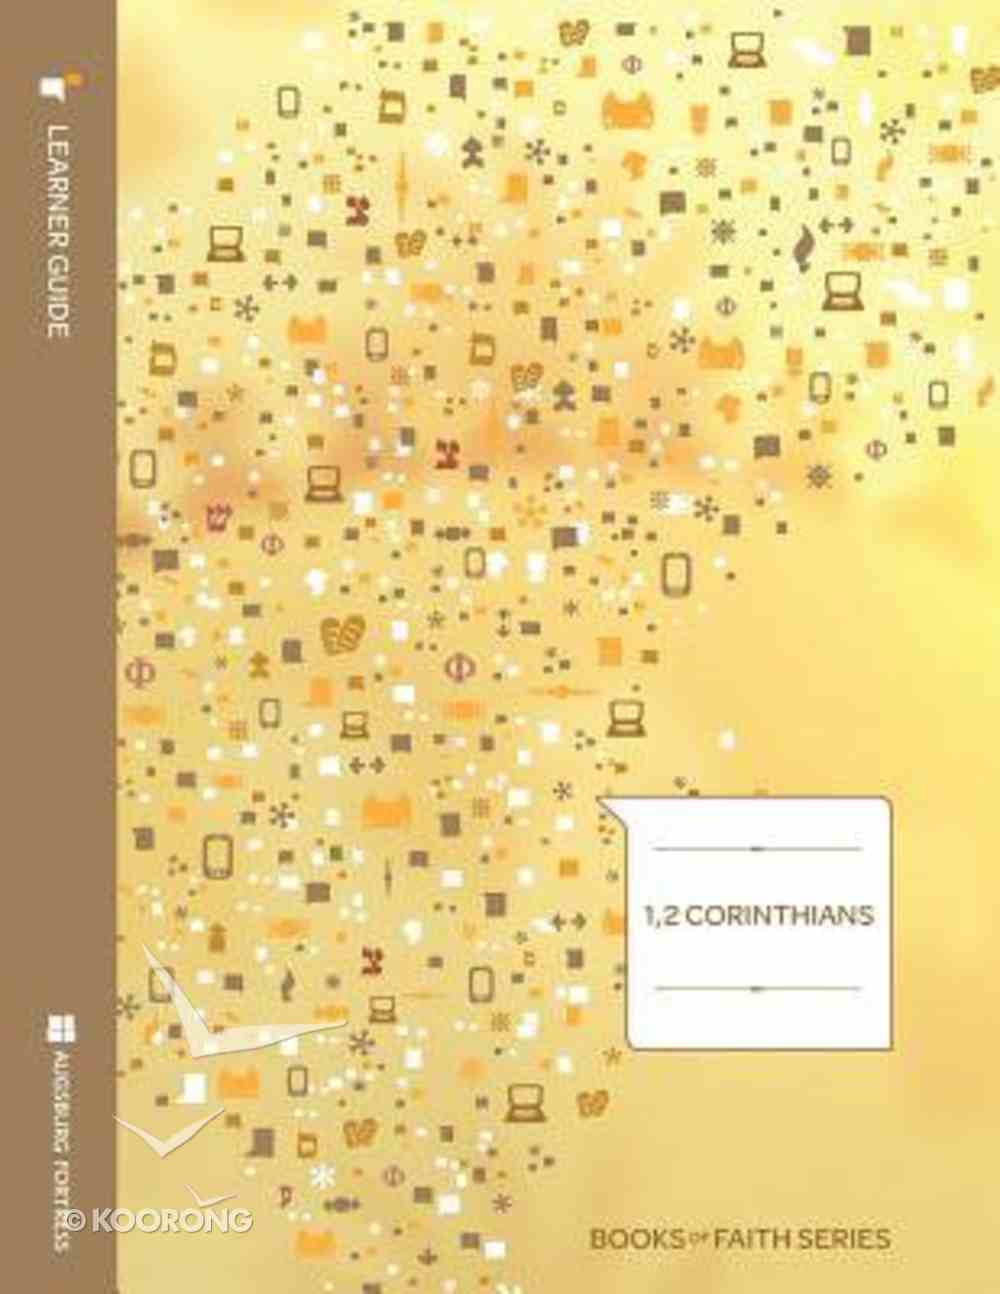 1 & 2 Corinthians (Learners Guide) (Books Of Faith Bible Studies Series) Paperback